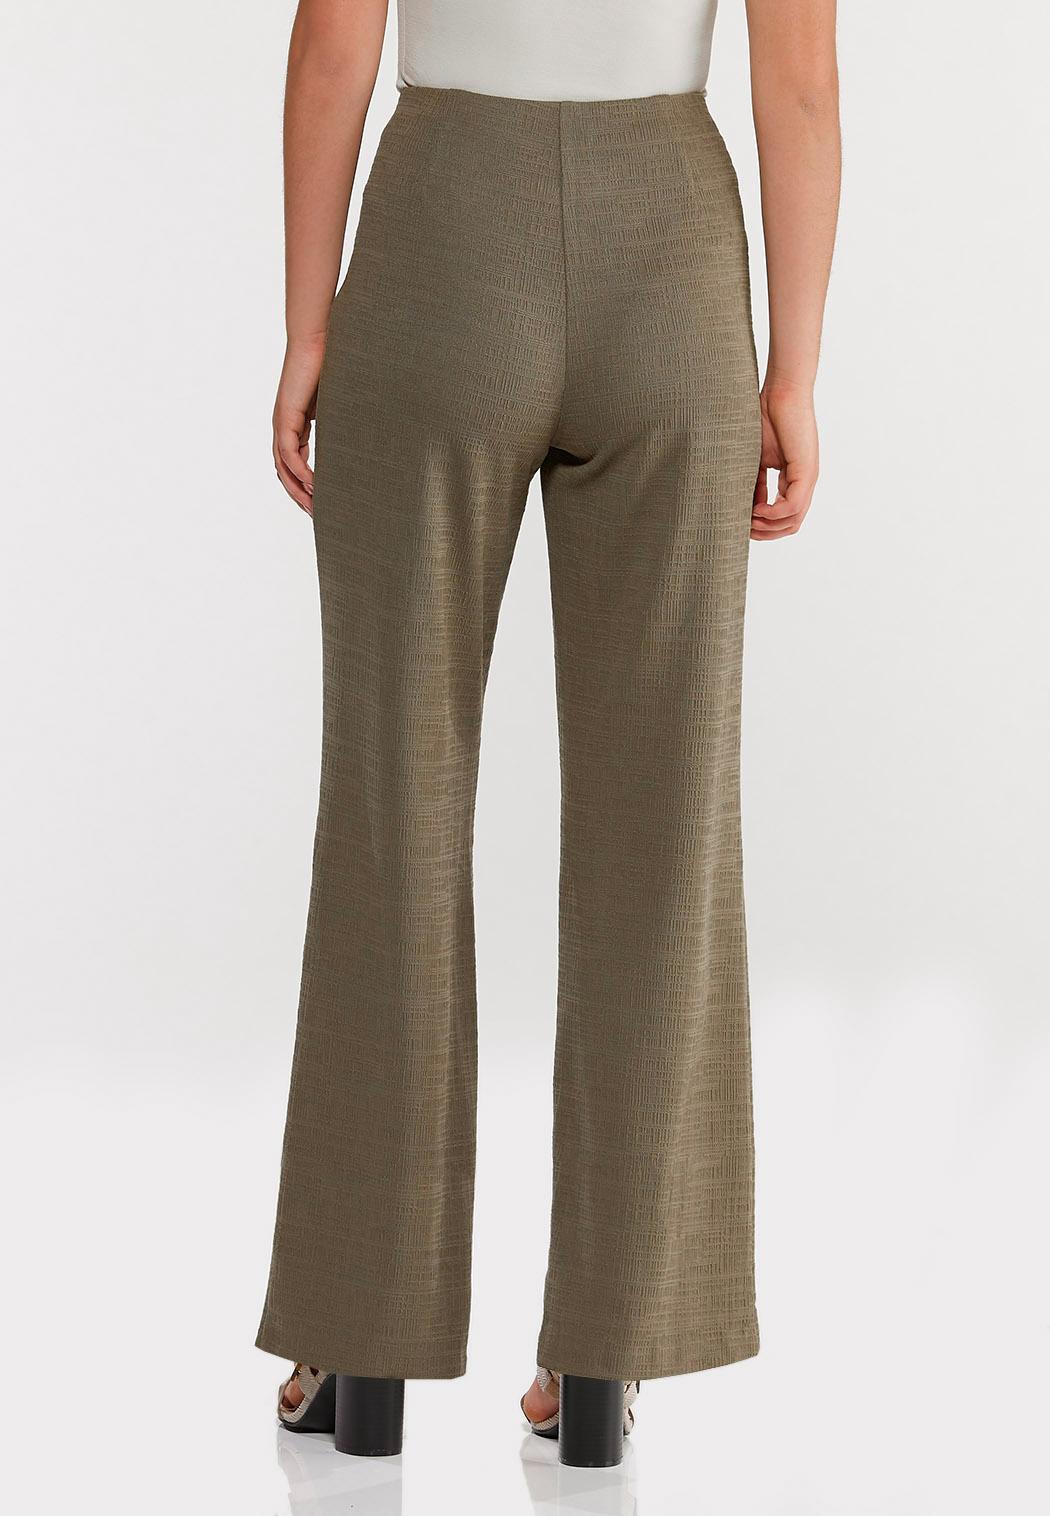 Petite Textured Self-Tie Pants (Item #44491501)